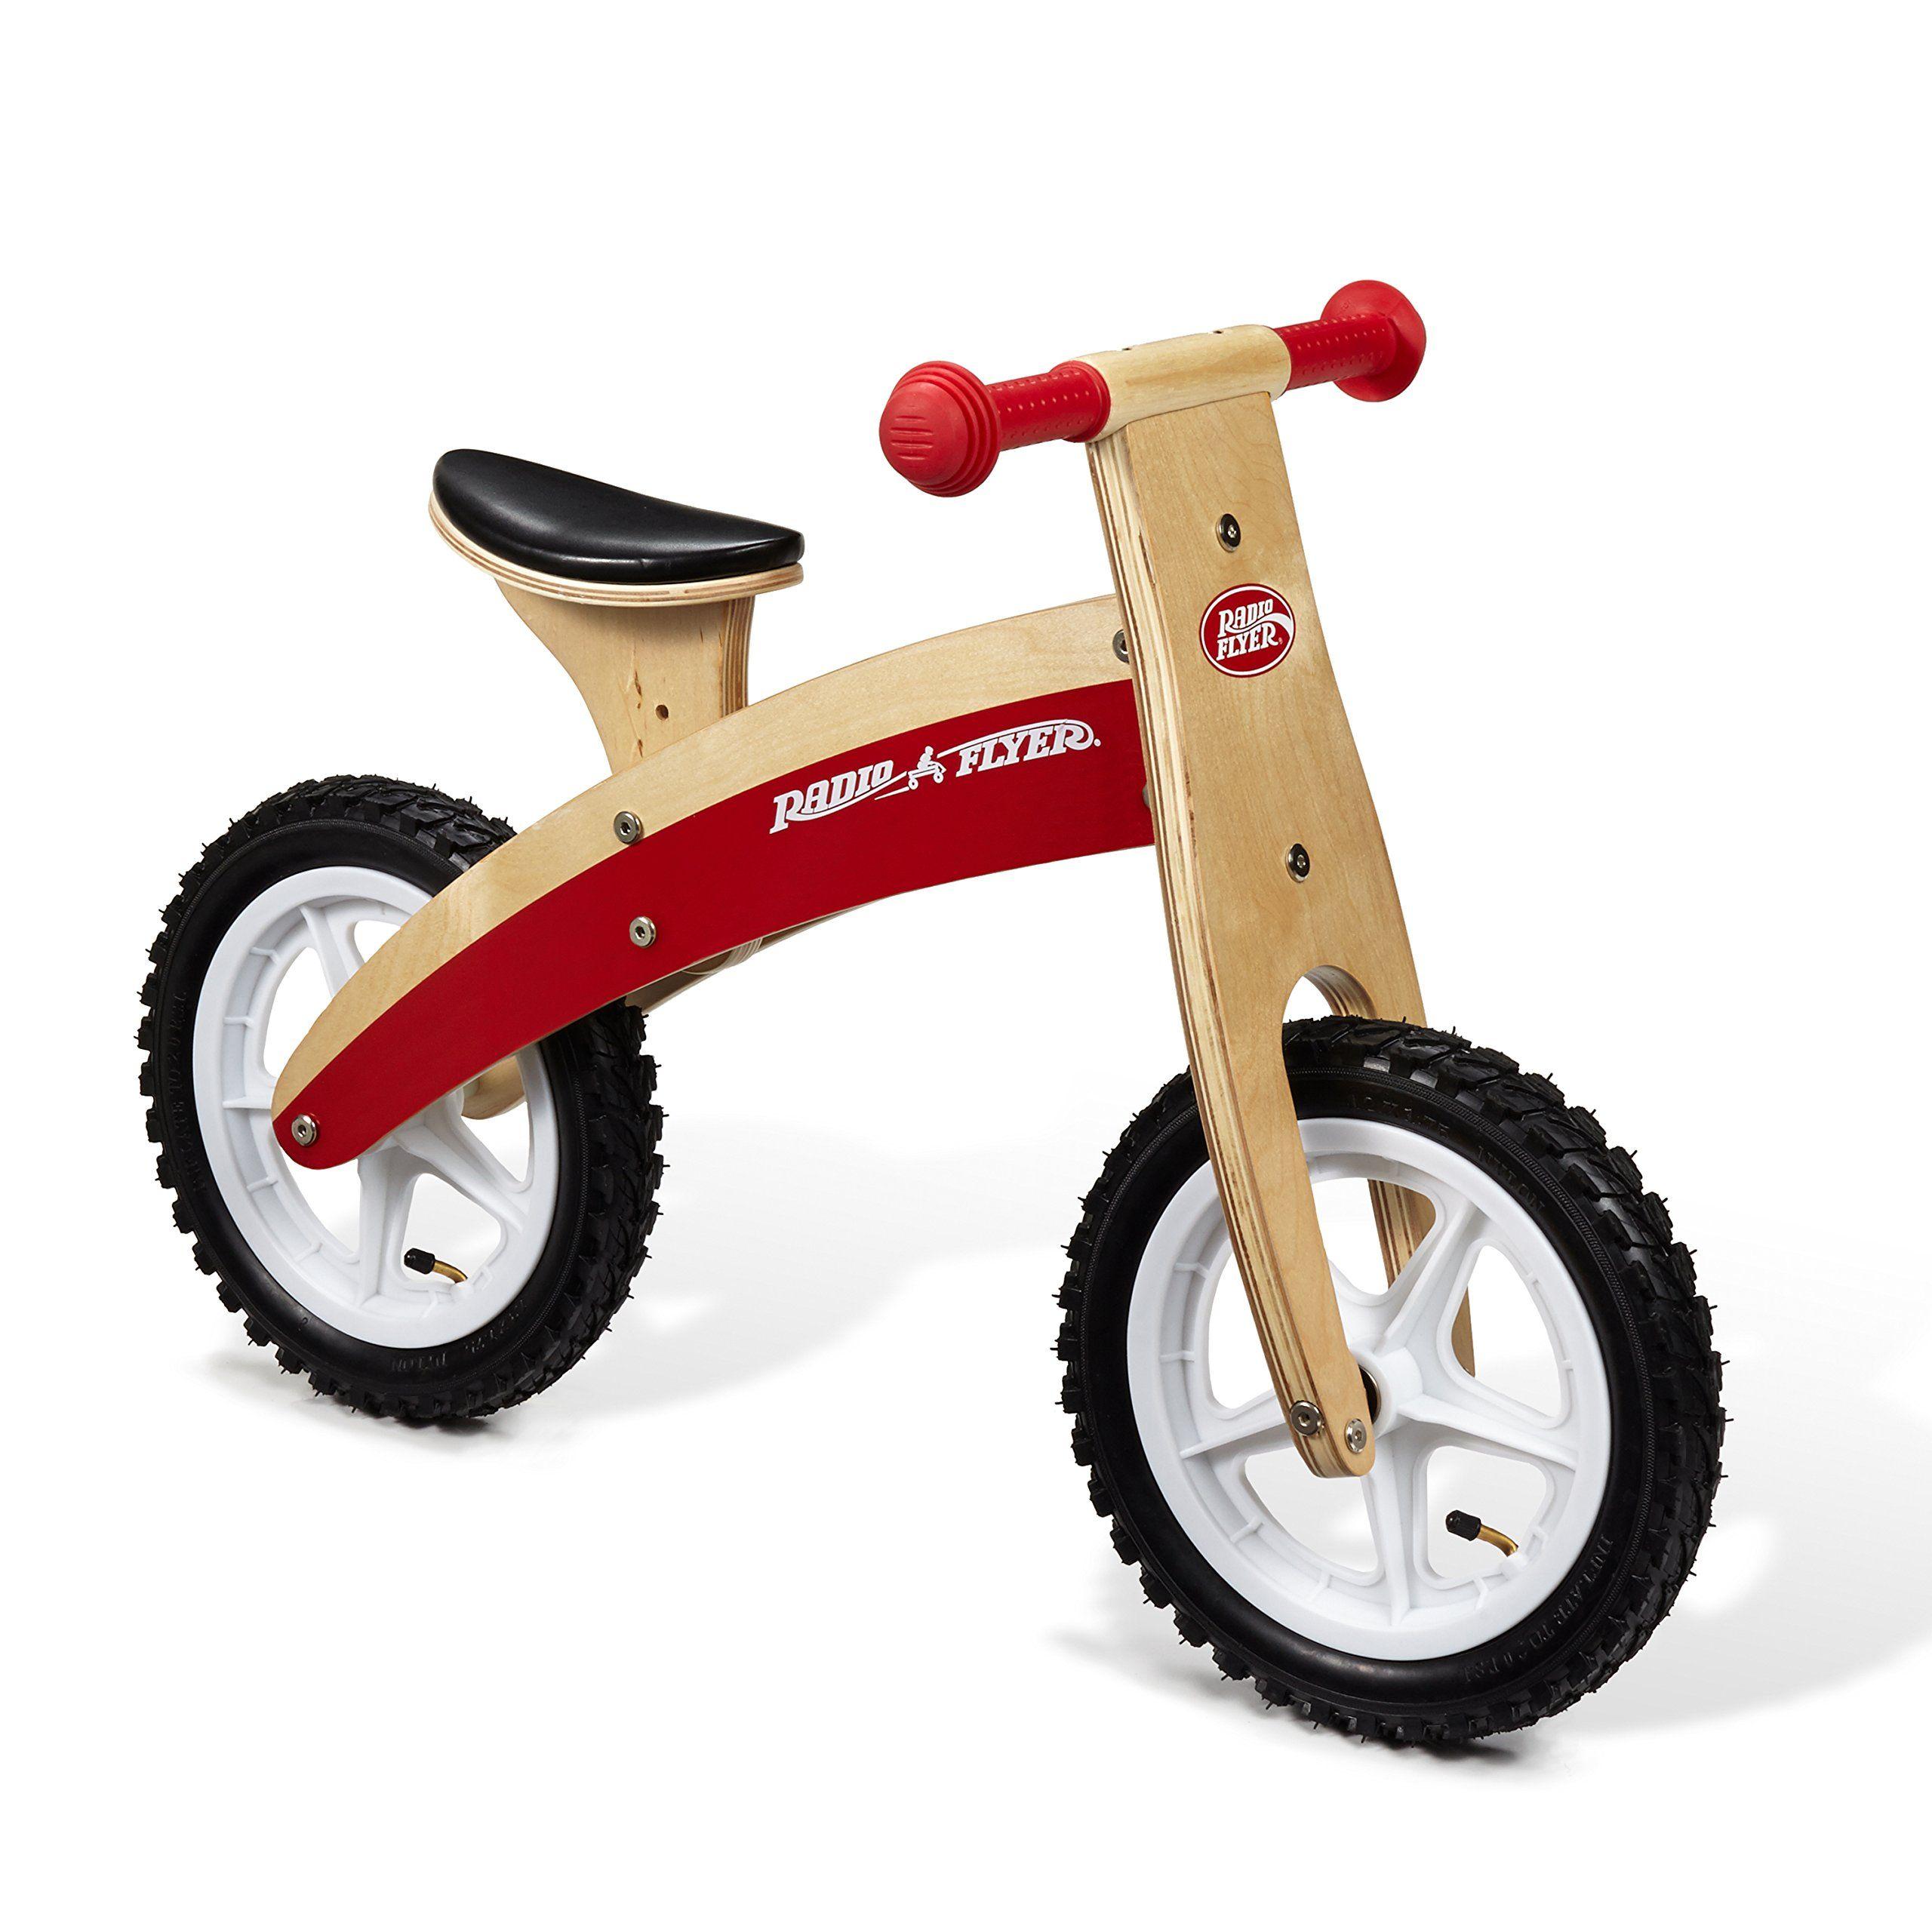 Radio Flyer Classic Glide Go Balance Bike A Balance Bike Vs A